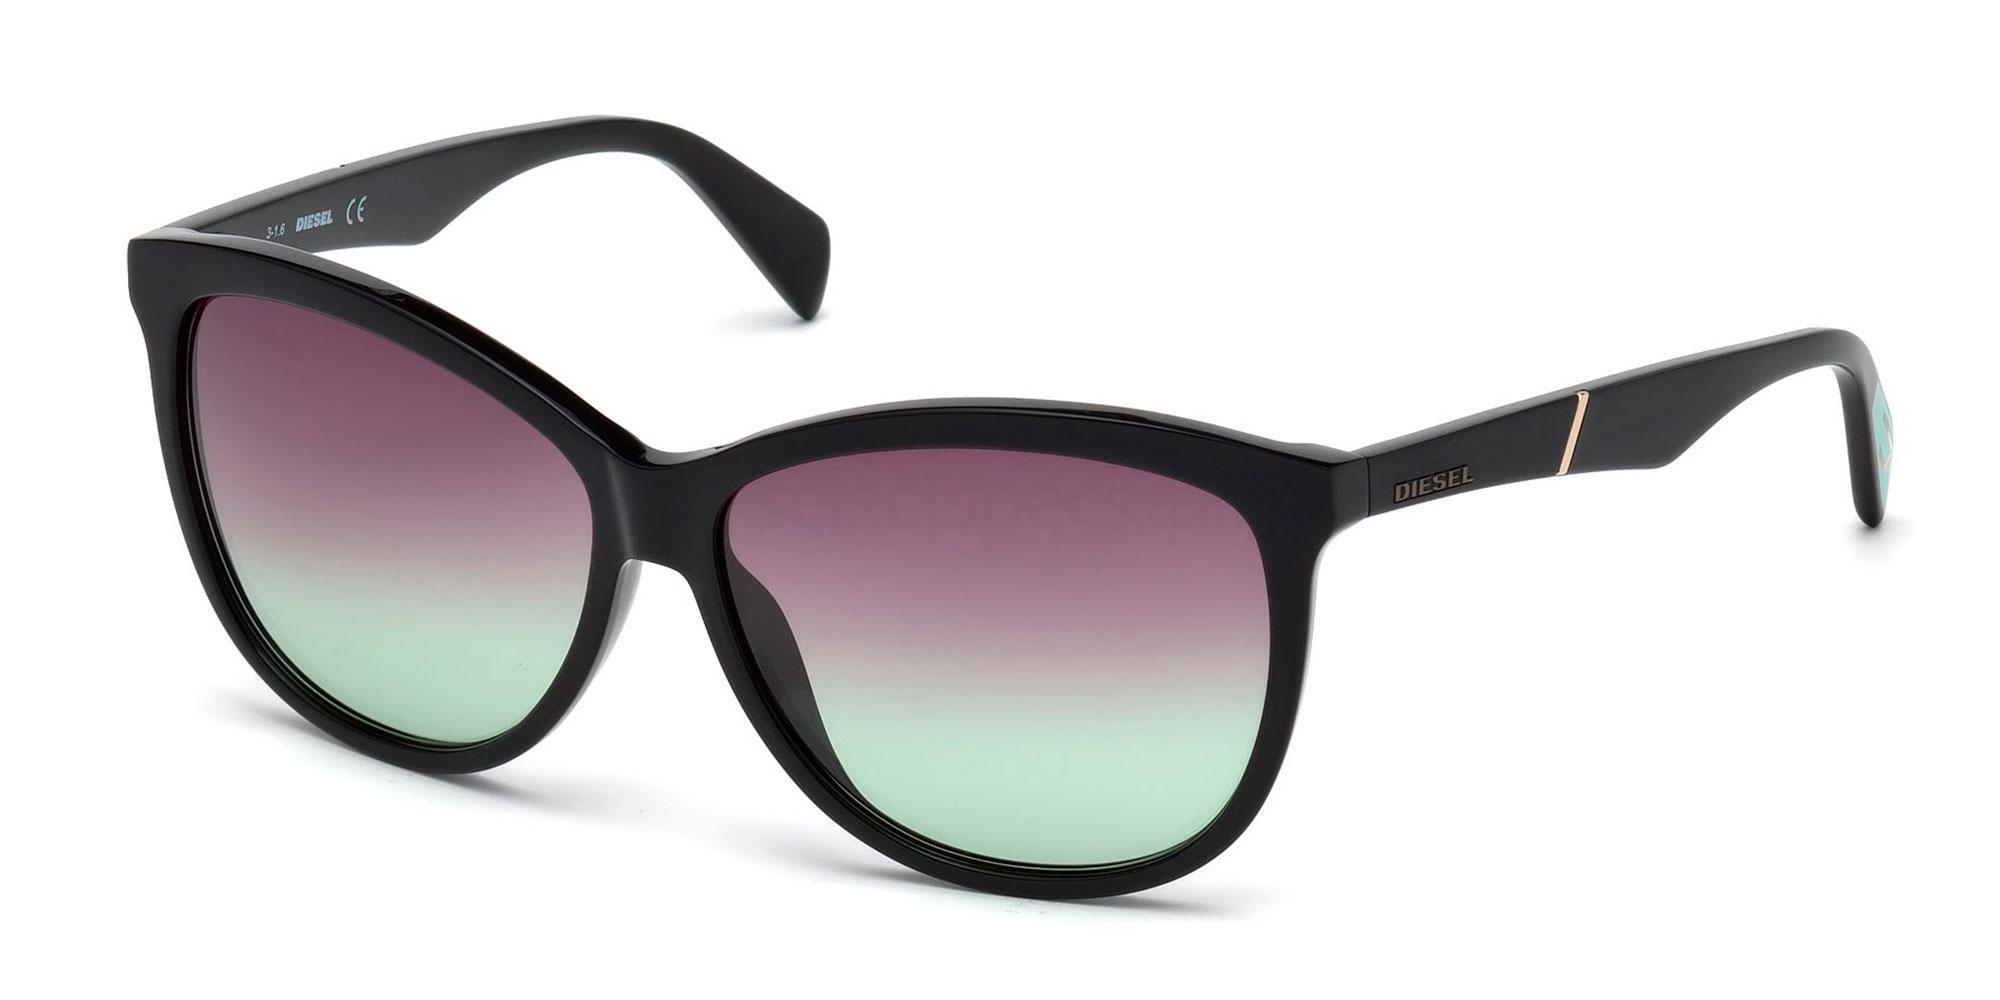 01T DL0221 Sunglasses, Diesel